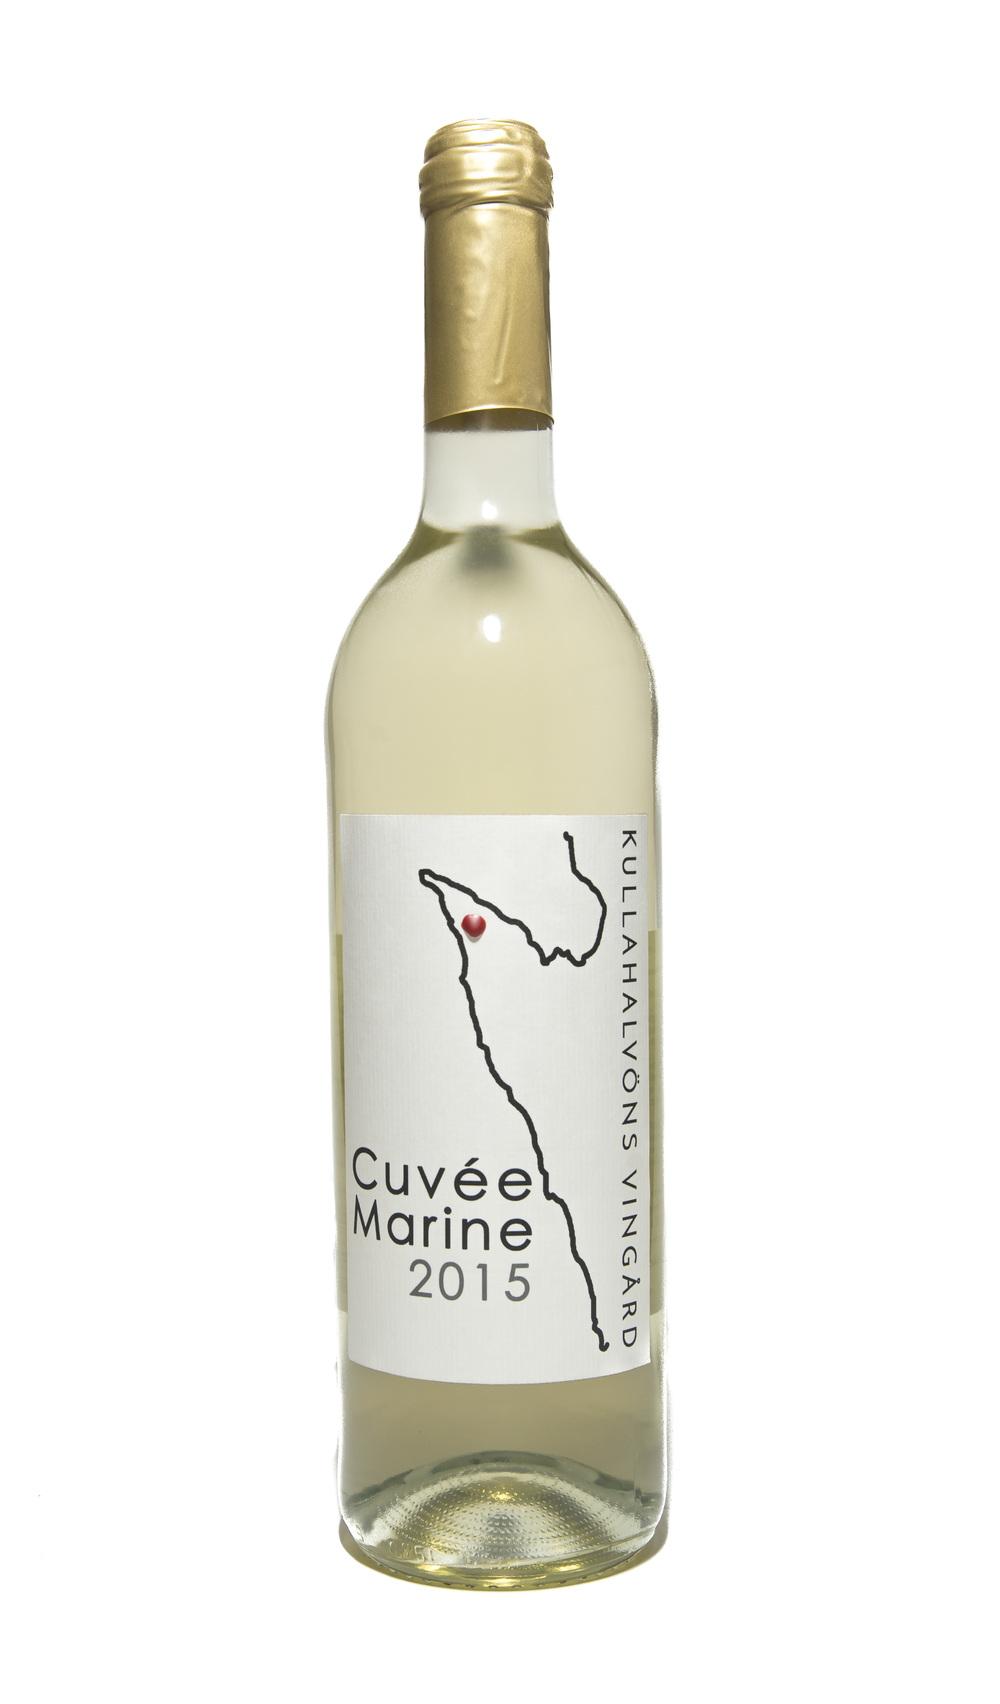 Cuvée Marine 2015